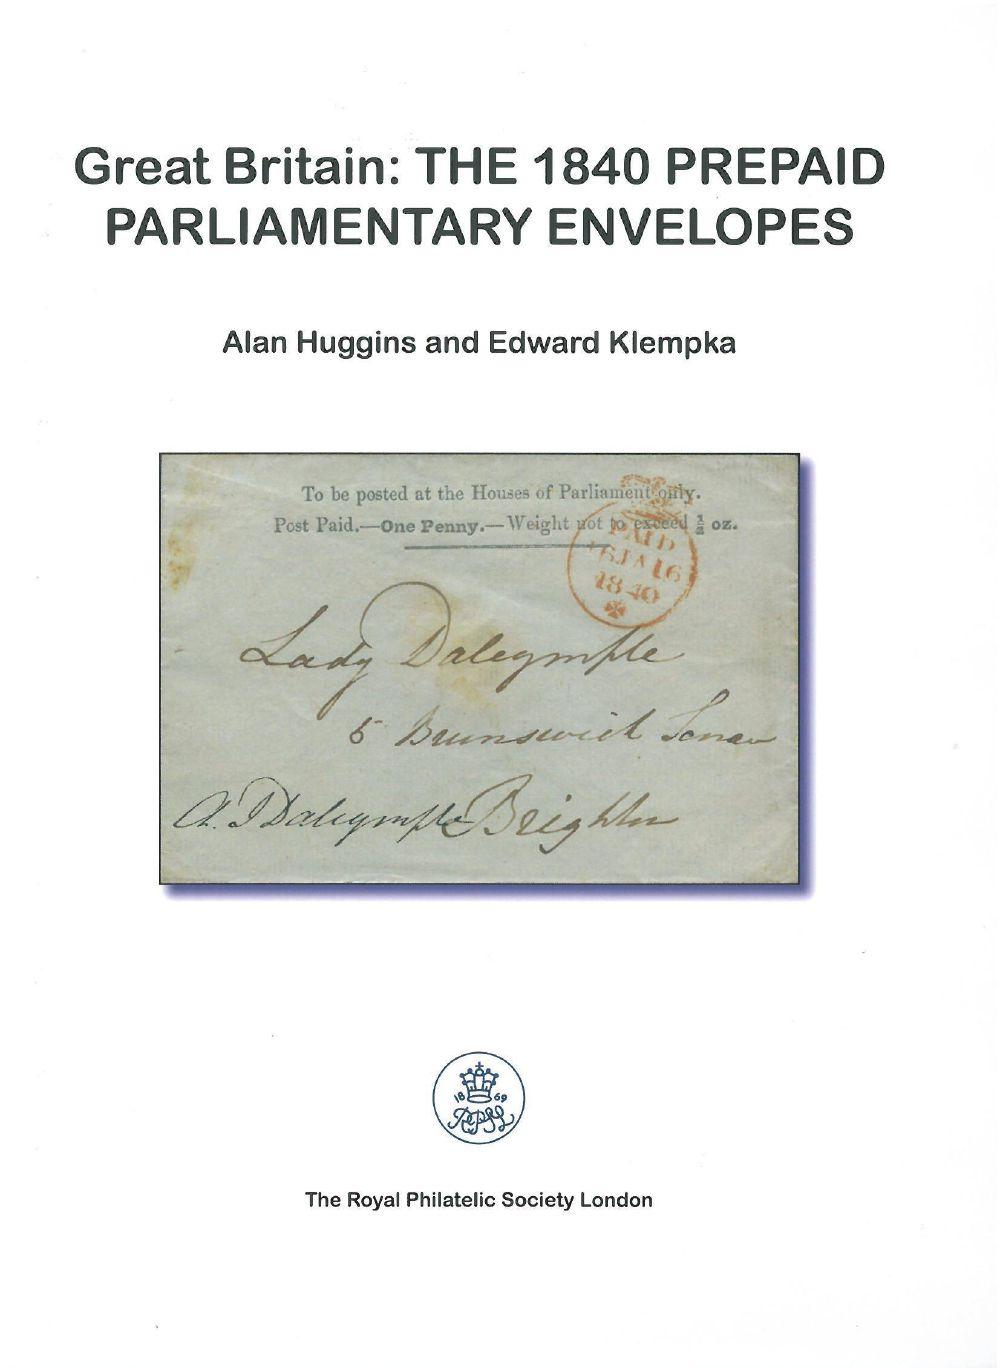 The 1840 Prepaid Parliamentary Envelopes